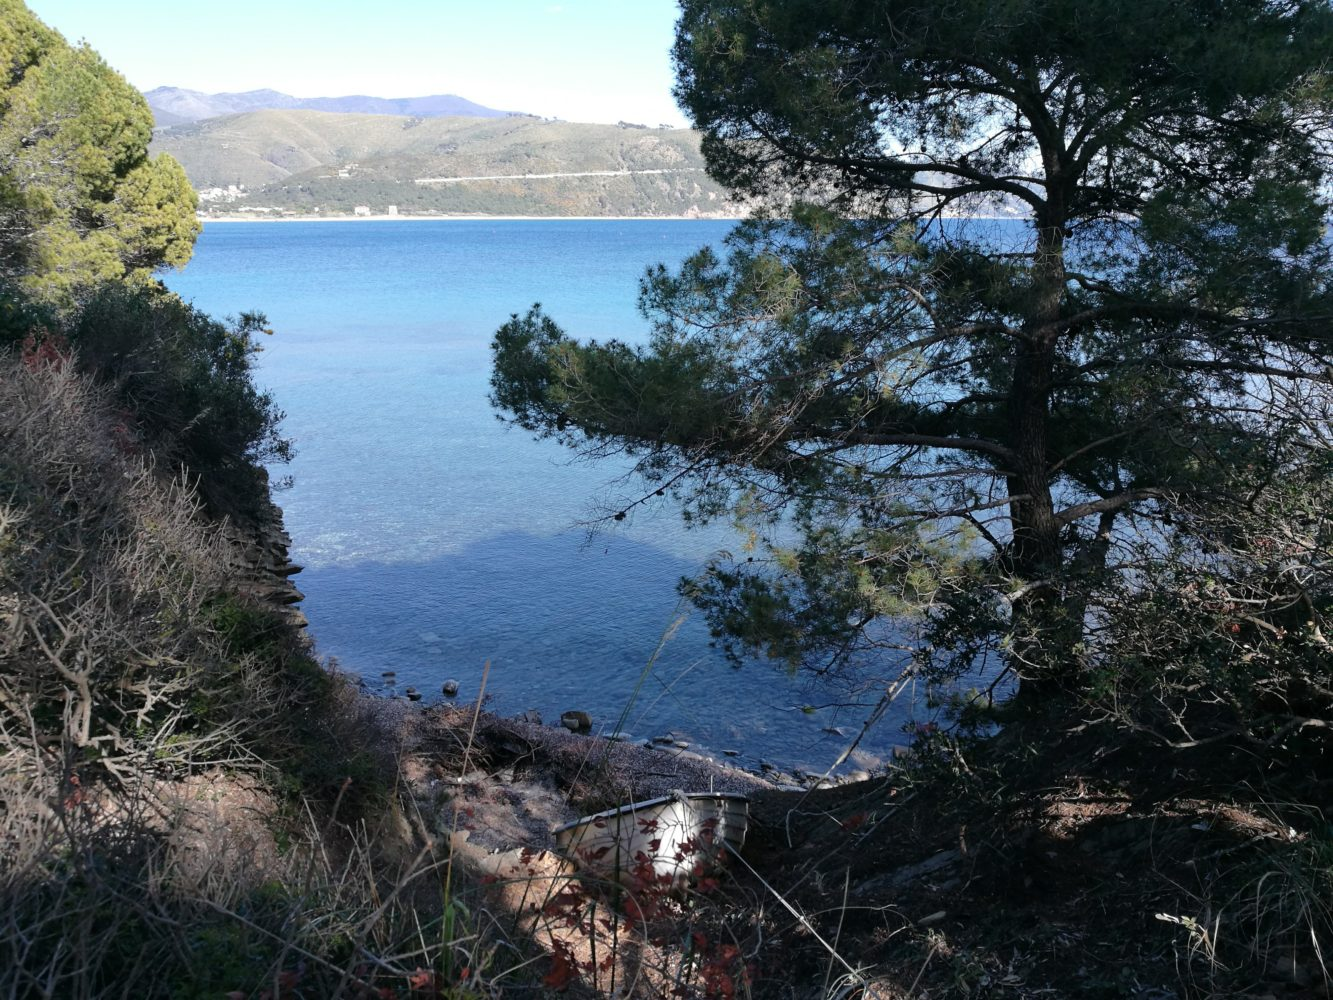 spiaggia-di-ogliastro-marina-spiagge-di-castellabate